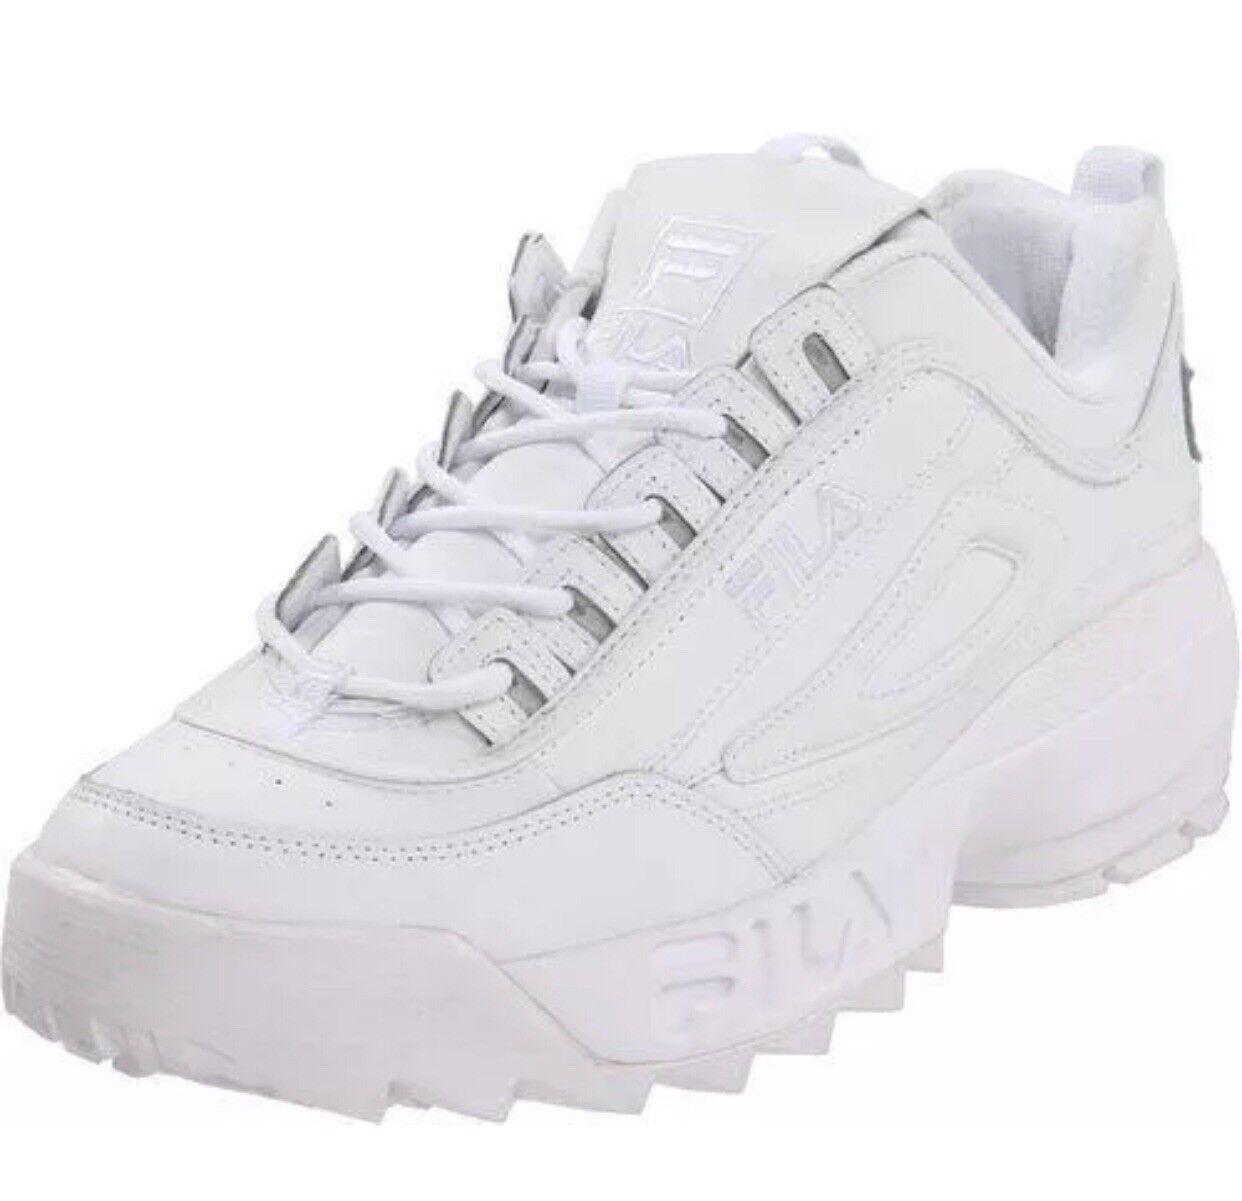 fila disruptor ii men FEO1655-148 White White Size 8 U S